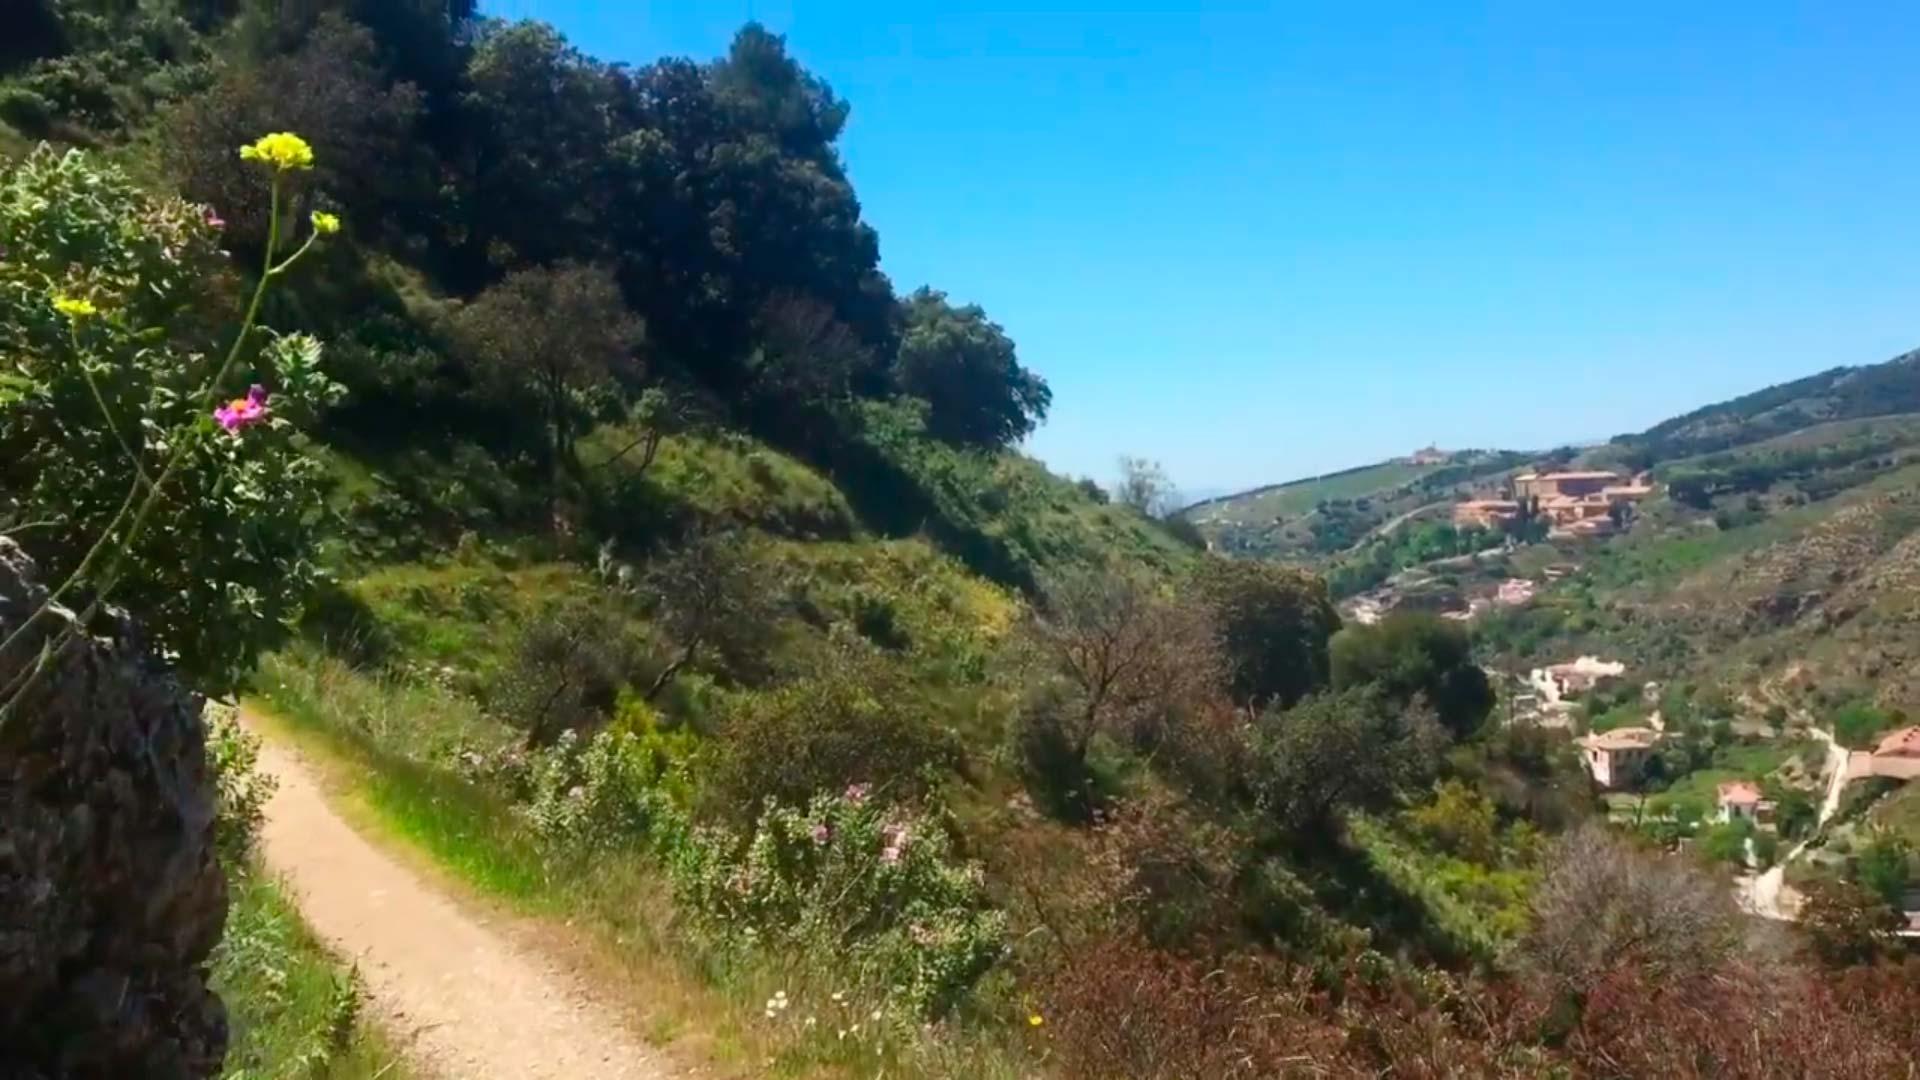 Dehesa del Generalife y Acequia Real